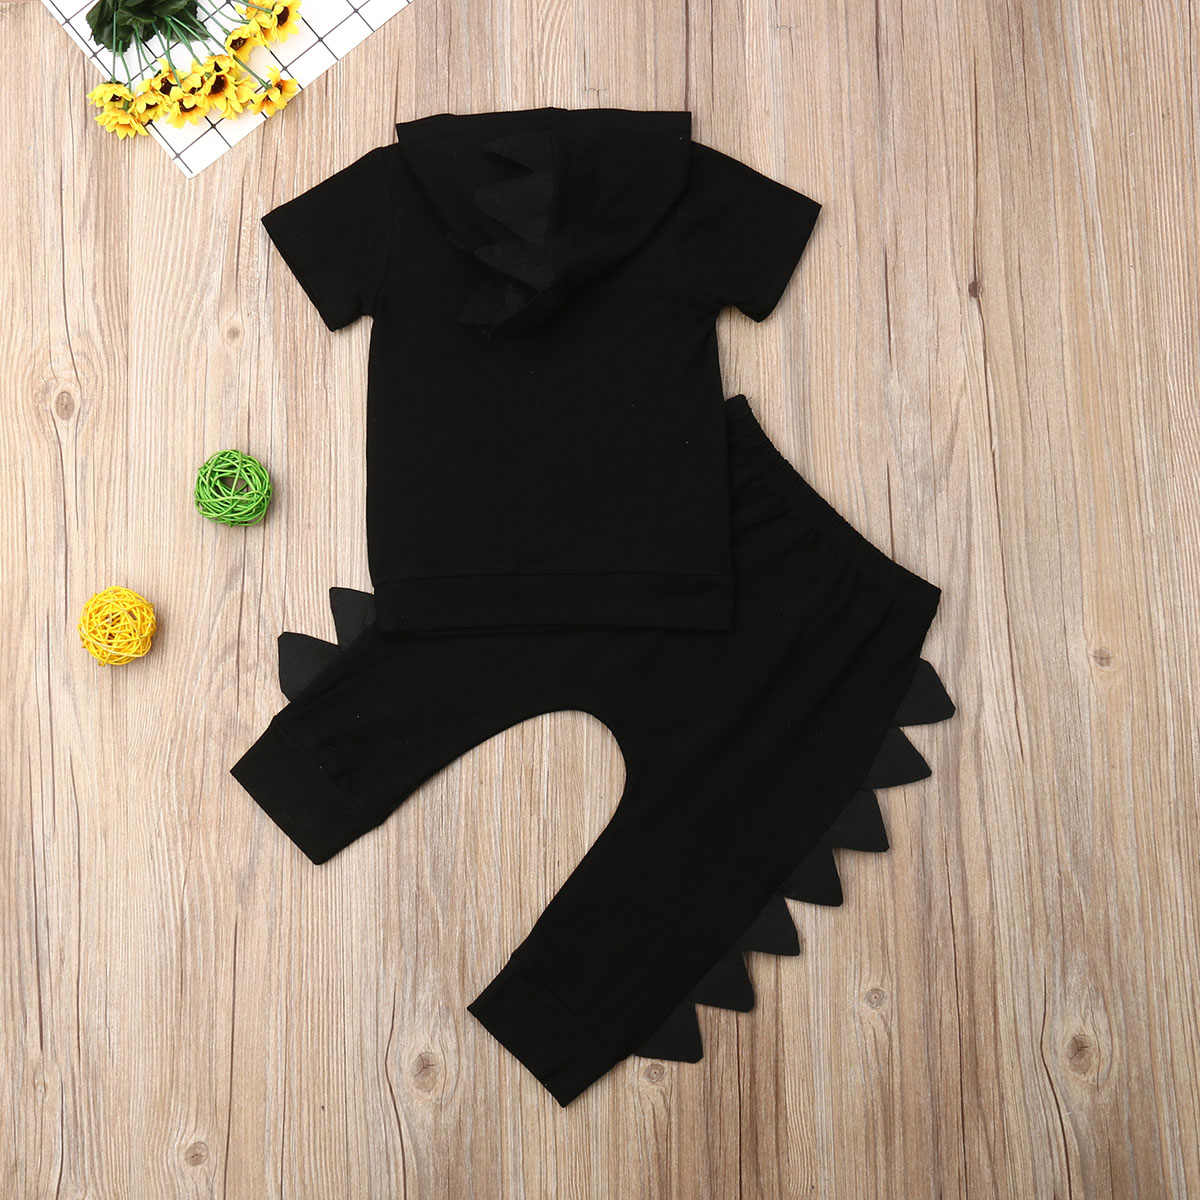 Dinosaurier Kinder Baby Boy Kleidung Set 2019 Neugeborenen Sommer Mit Kapuze Kurzarm Schwarz Solide T-shirt Tops Hosen Hosen Outfit 2PCs